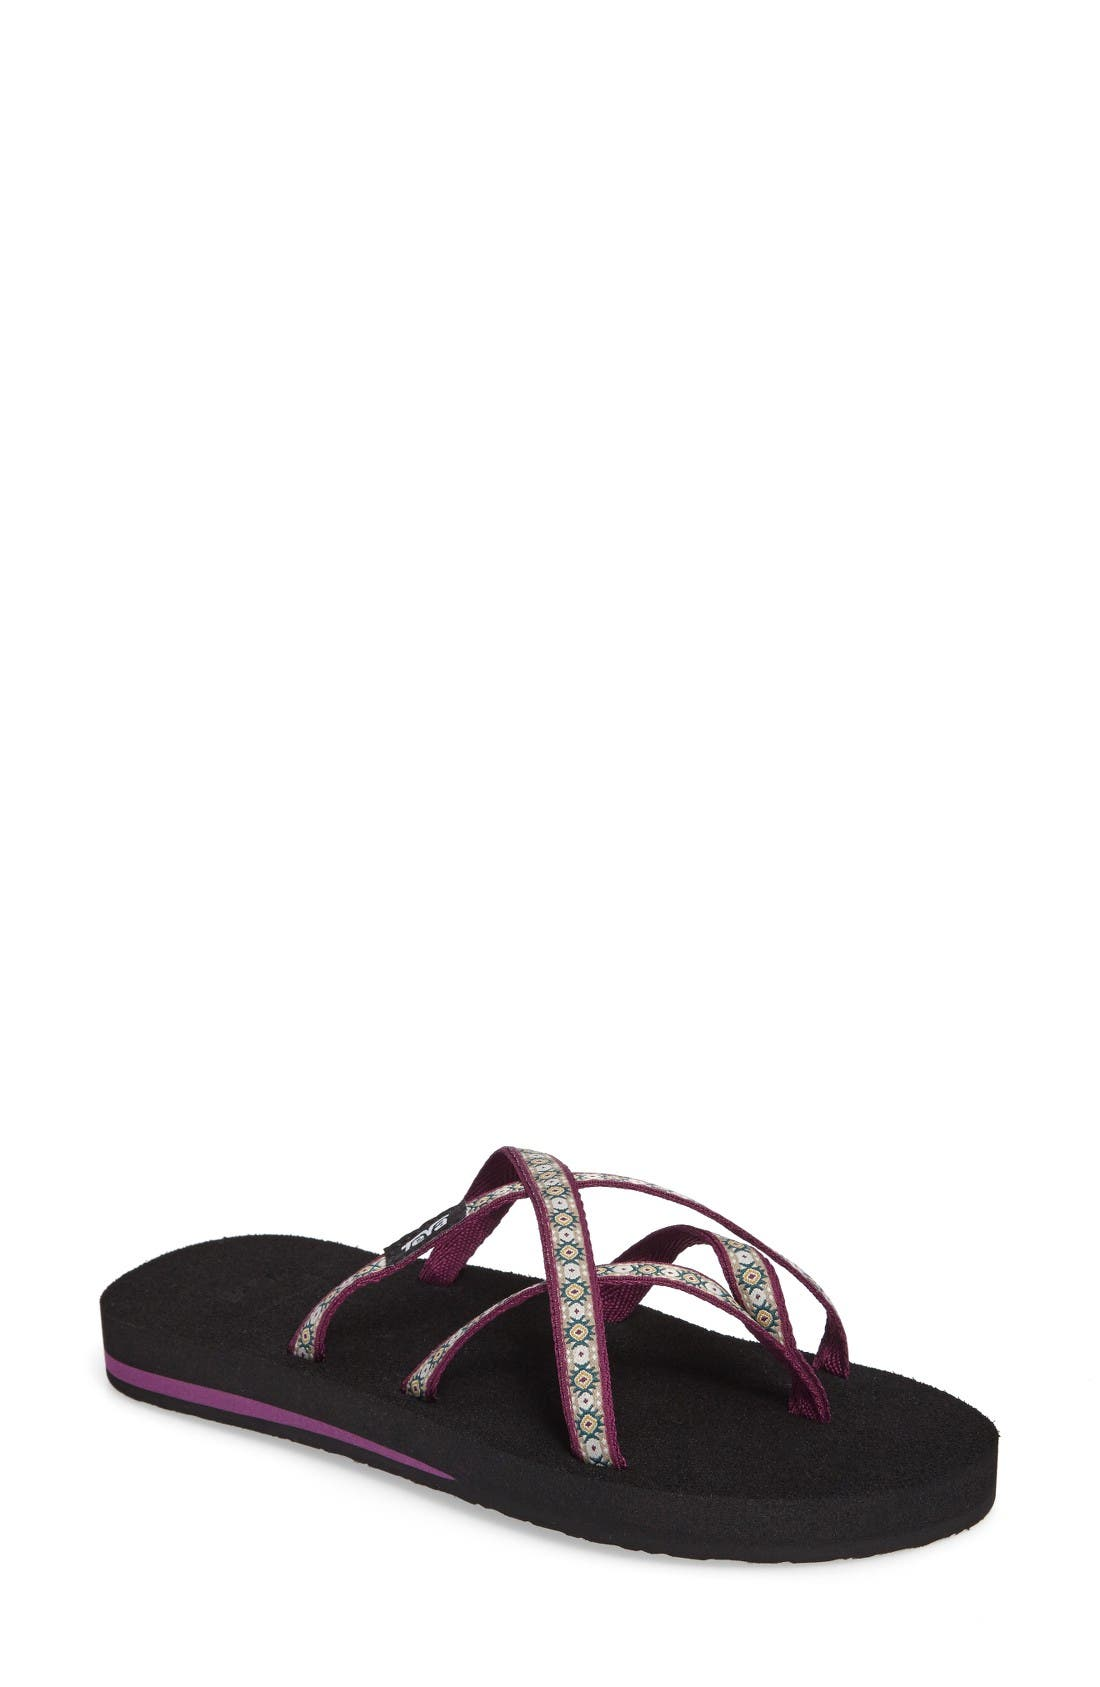 Main Image - Teva 'Olowahu' Sandal (Women)